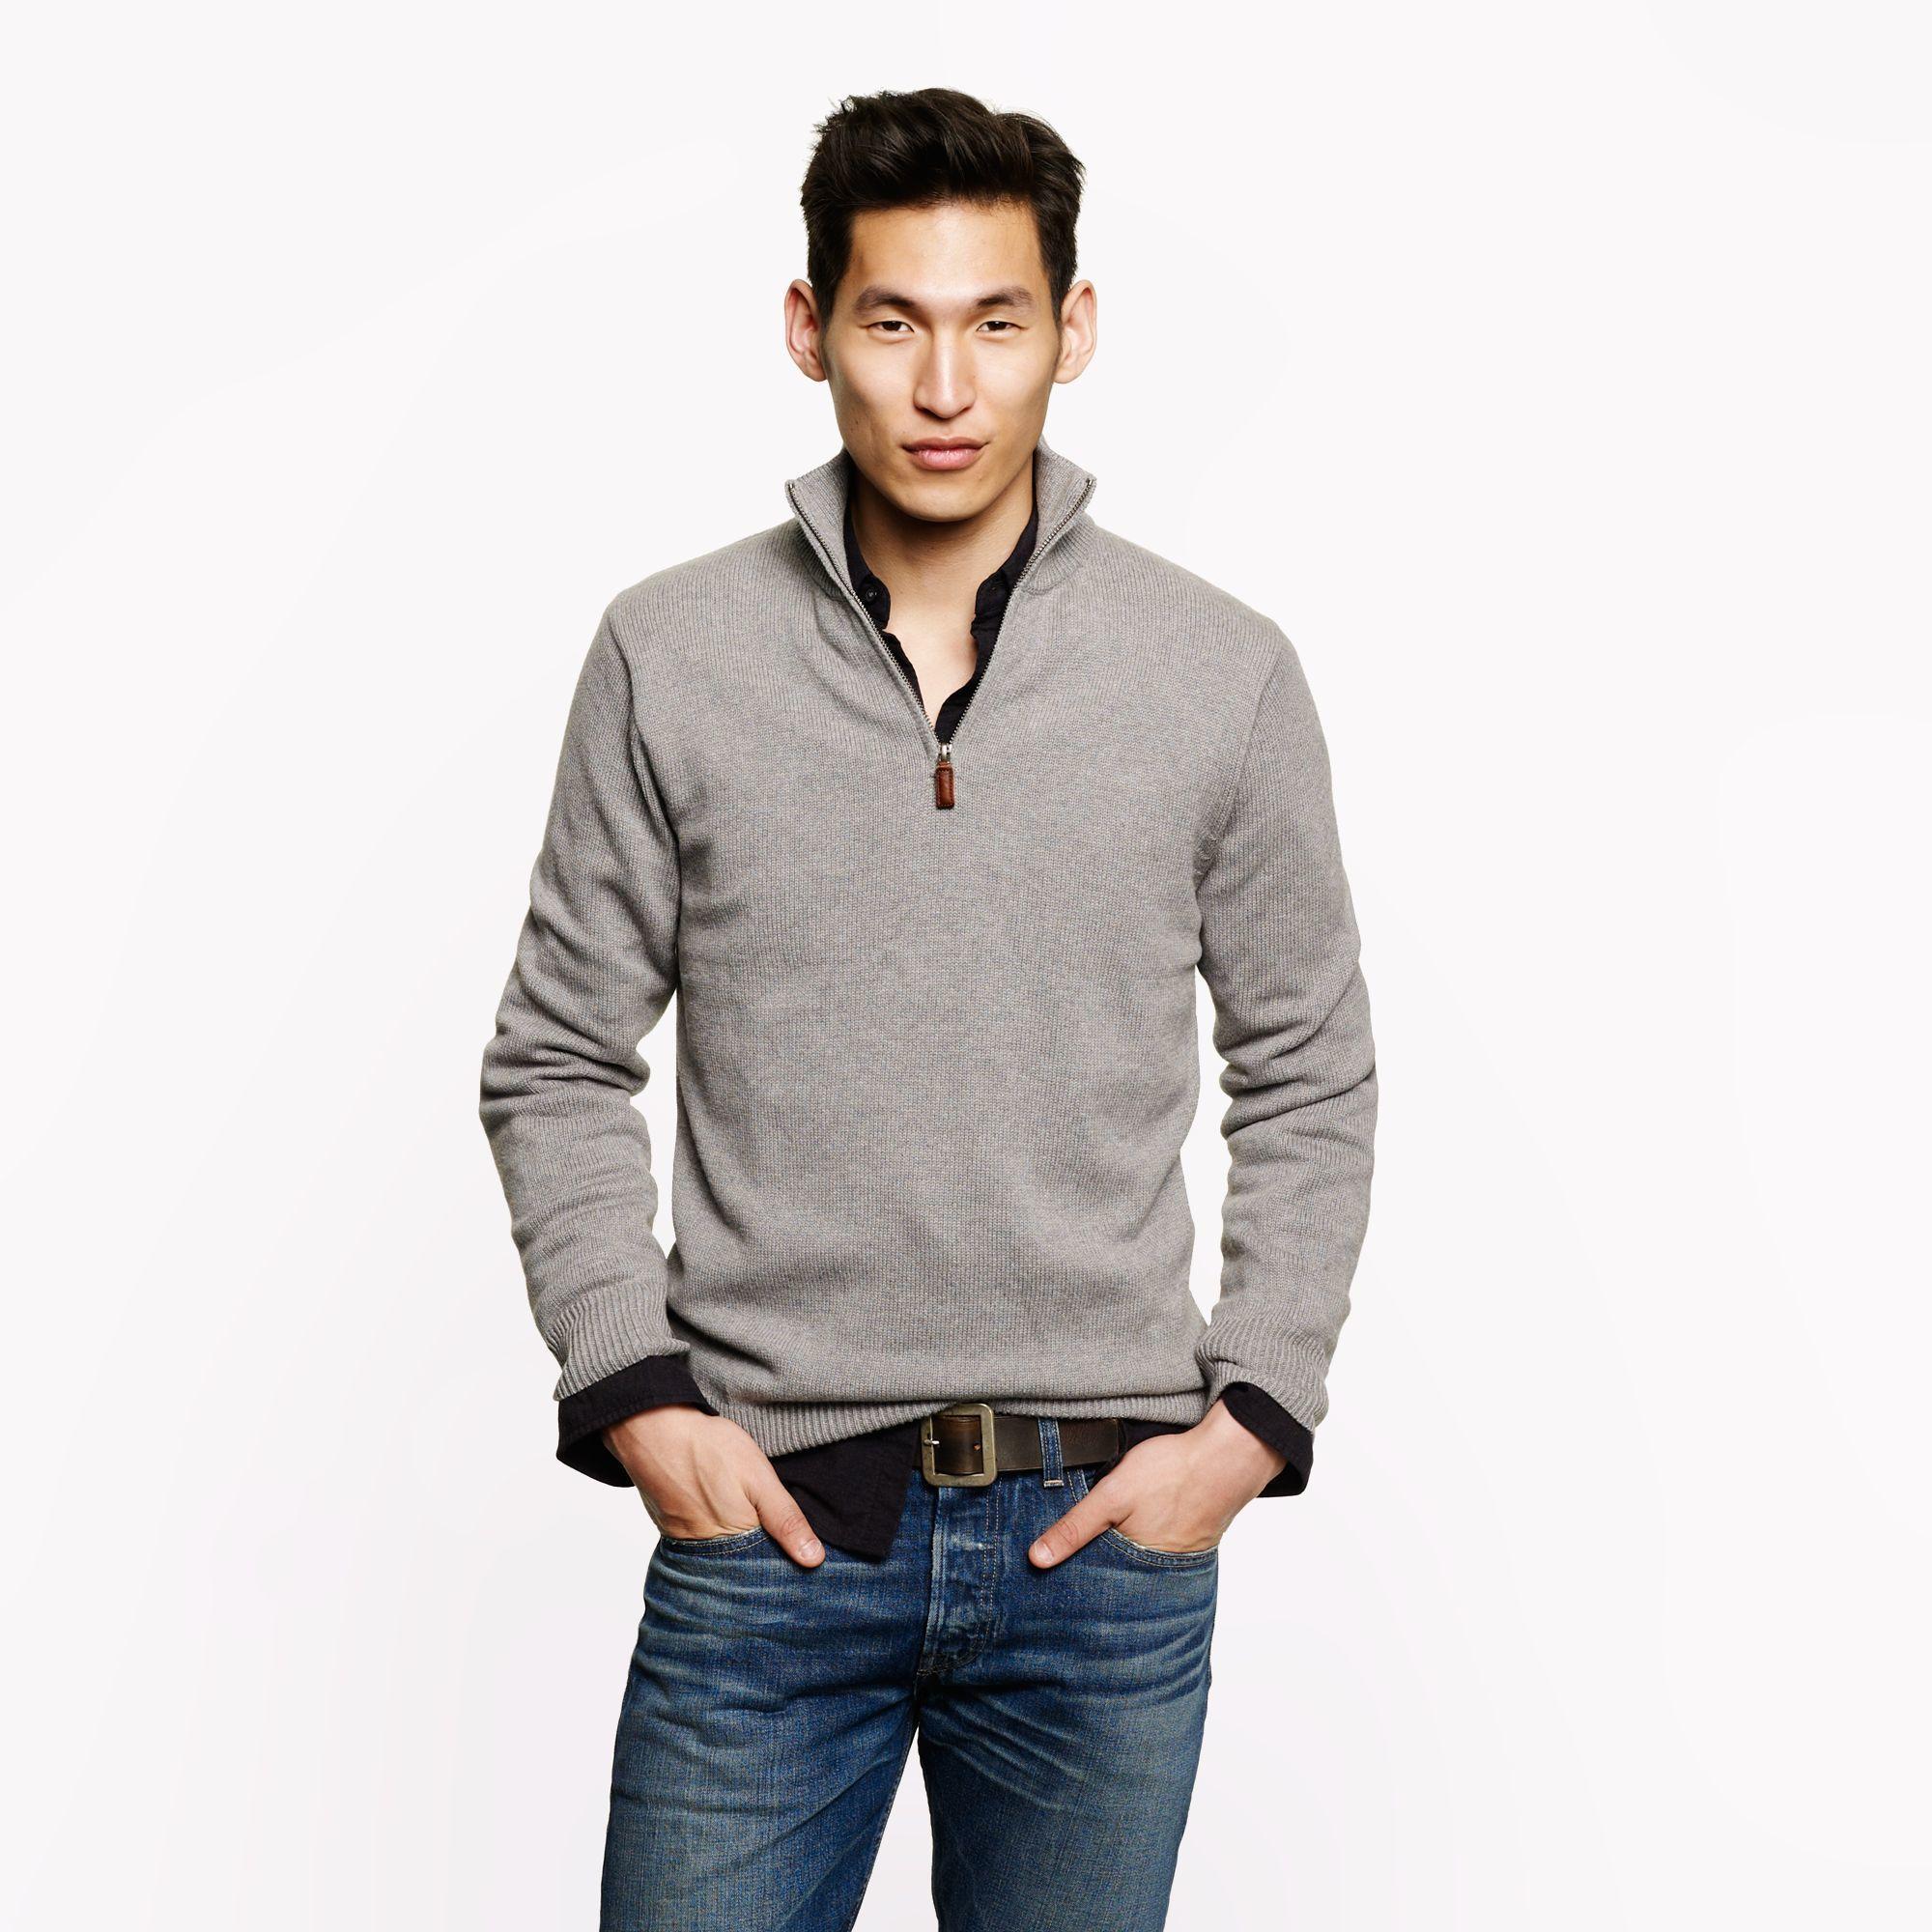 Men's Grey Zip Neck Sweater, Black Long Sleeve Shirt, Blue Jeans ...